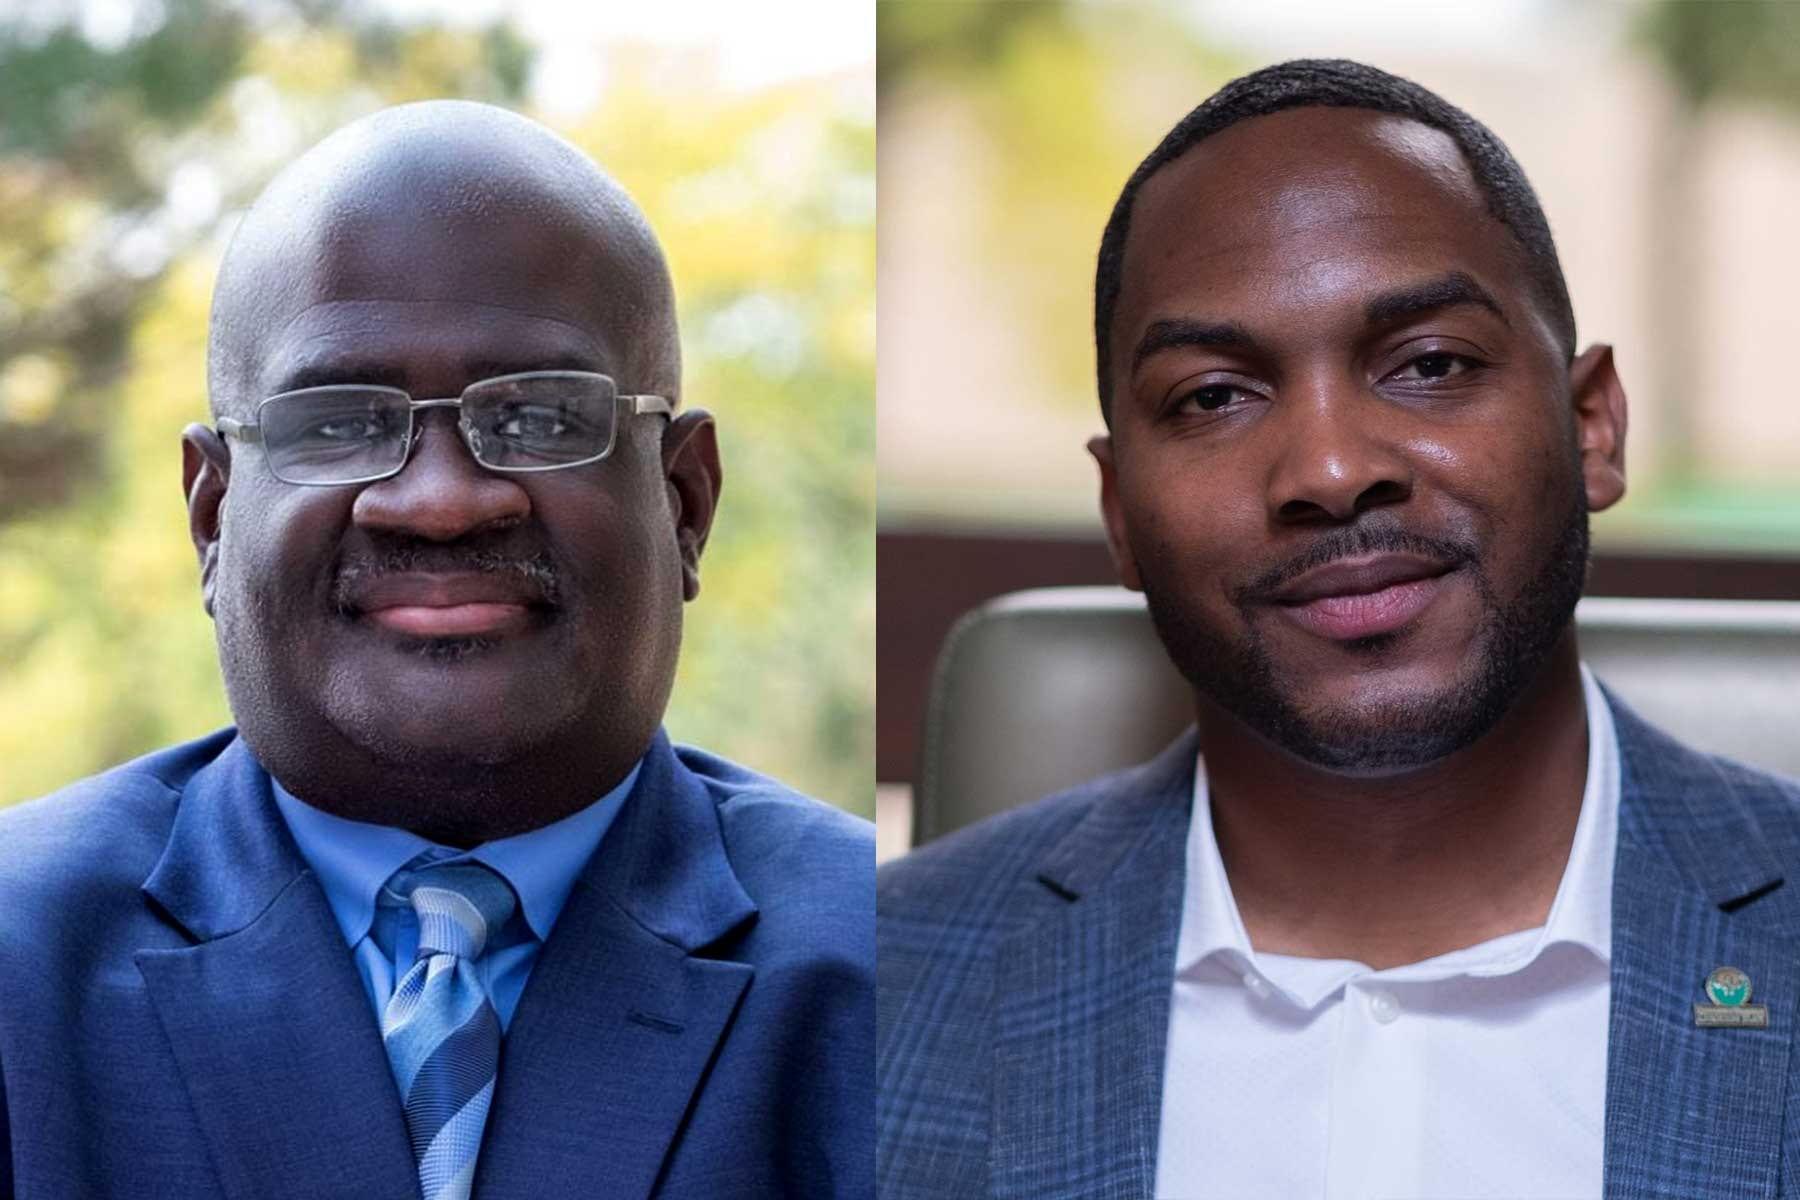 Corey King and Cordero Barkley Black Power 51 Wis. Influential Leaders